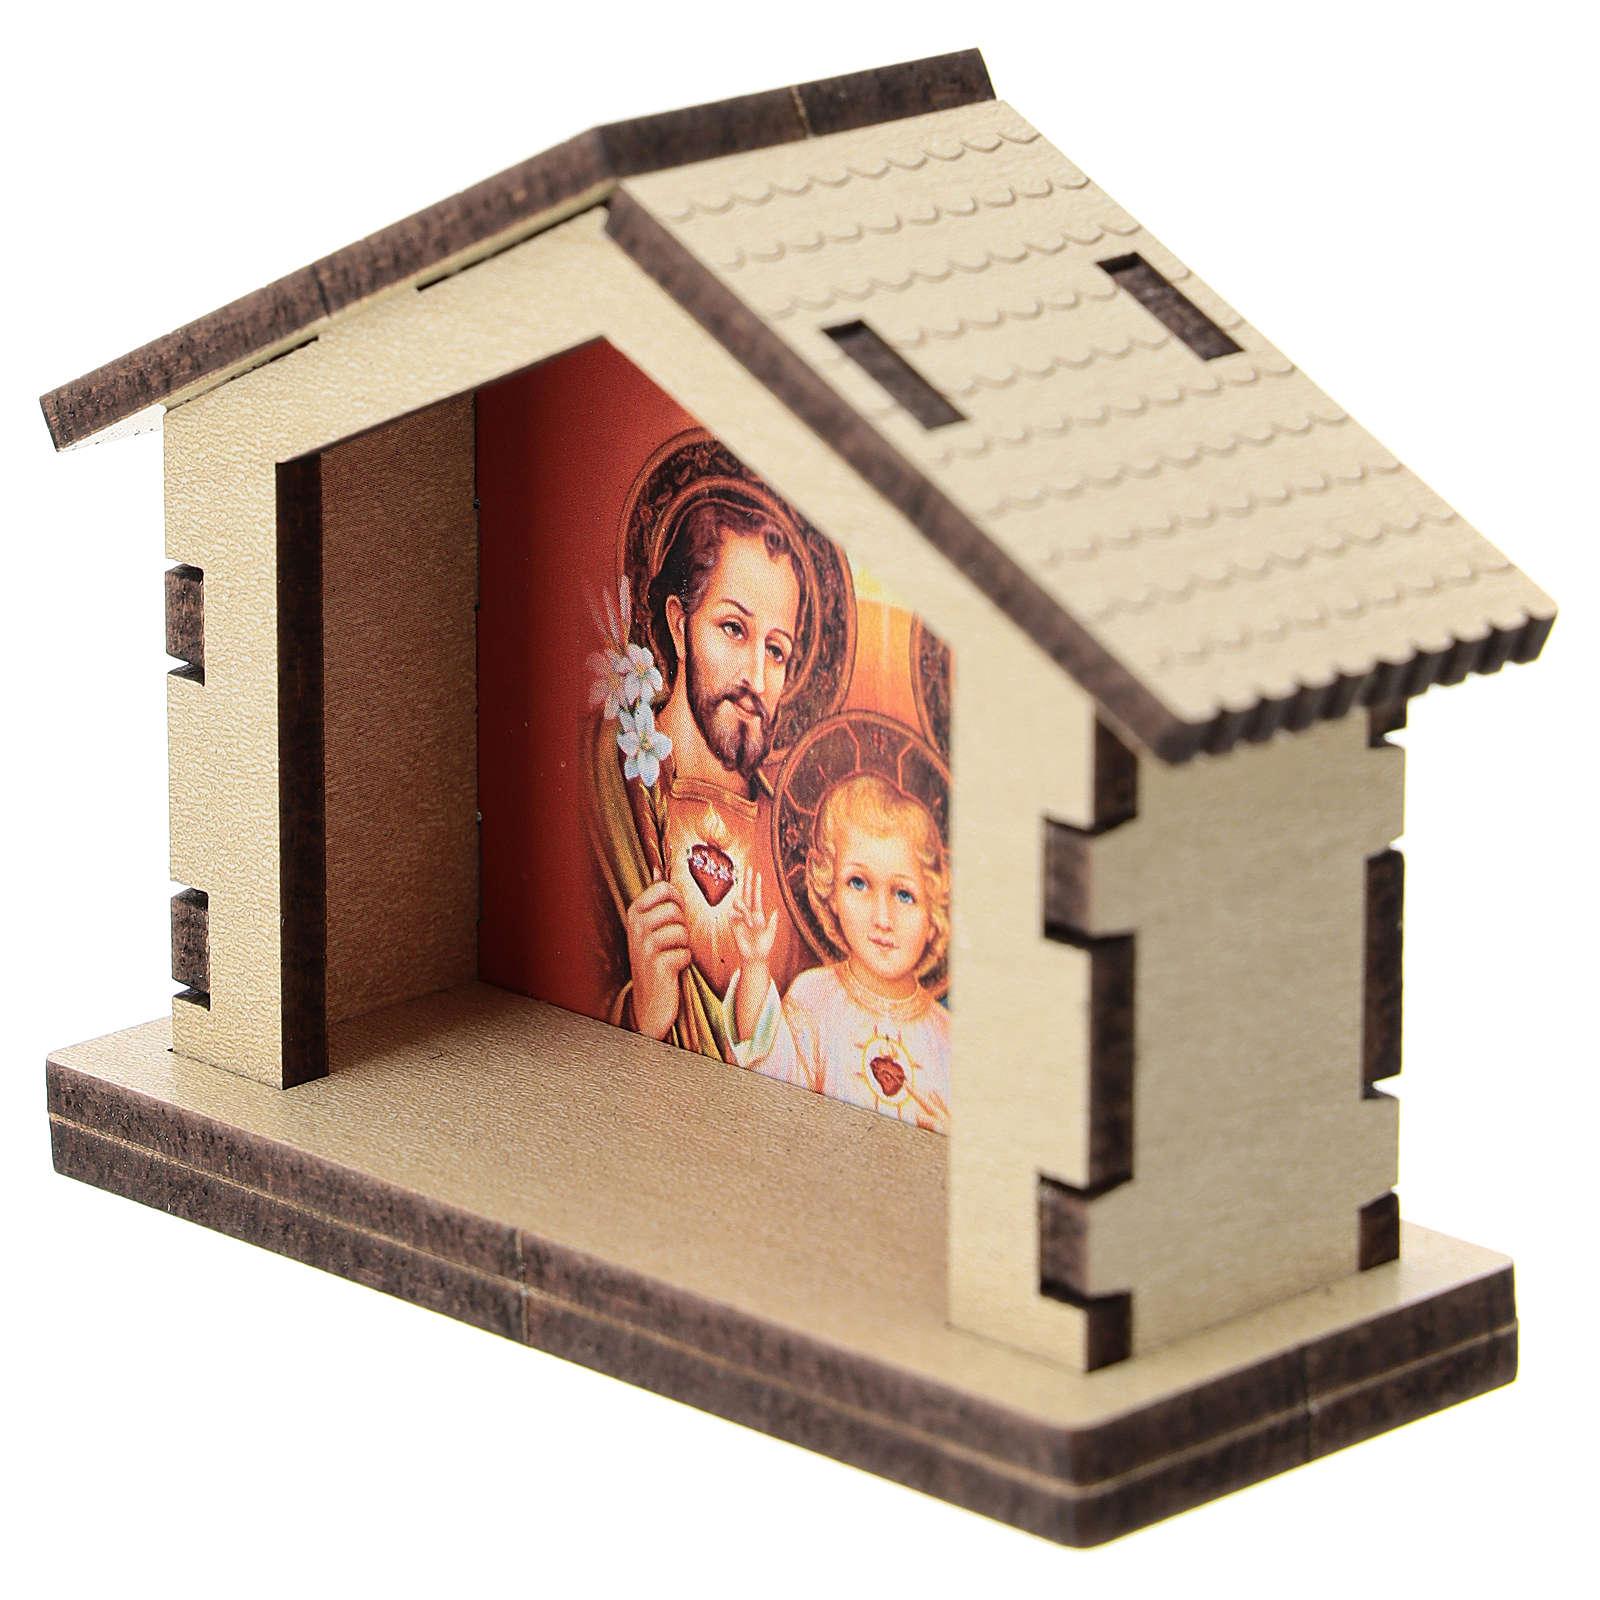 Capanna legno sfondo Sacra Famiglia 5 cm 3